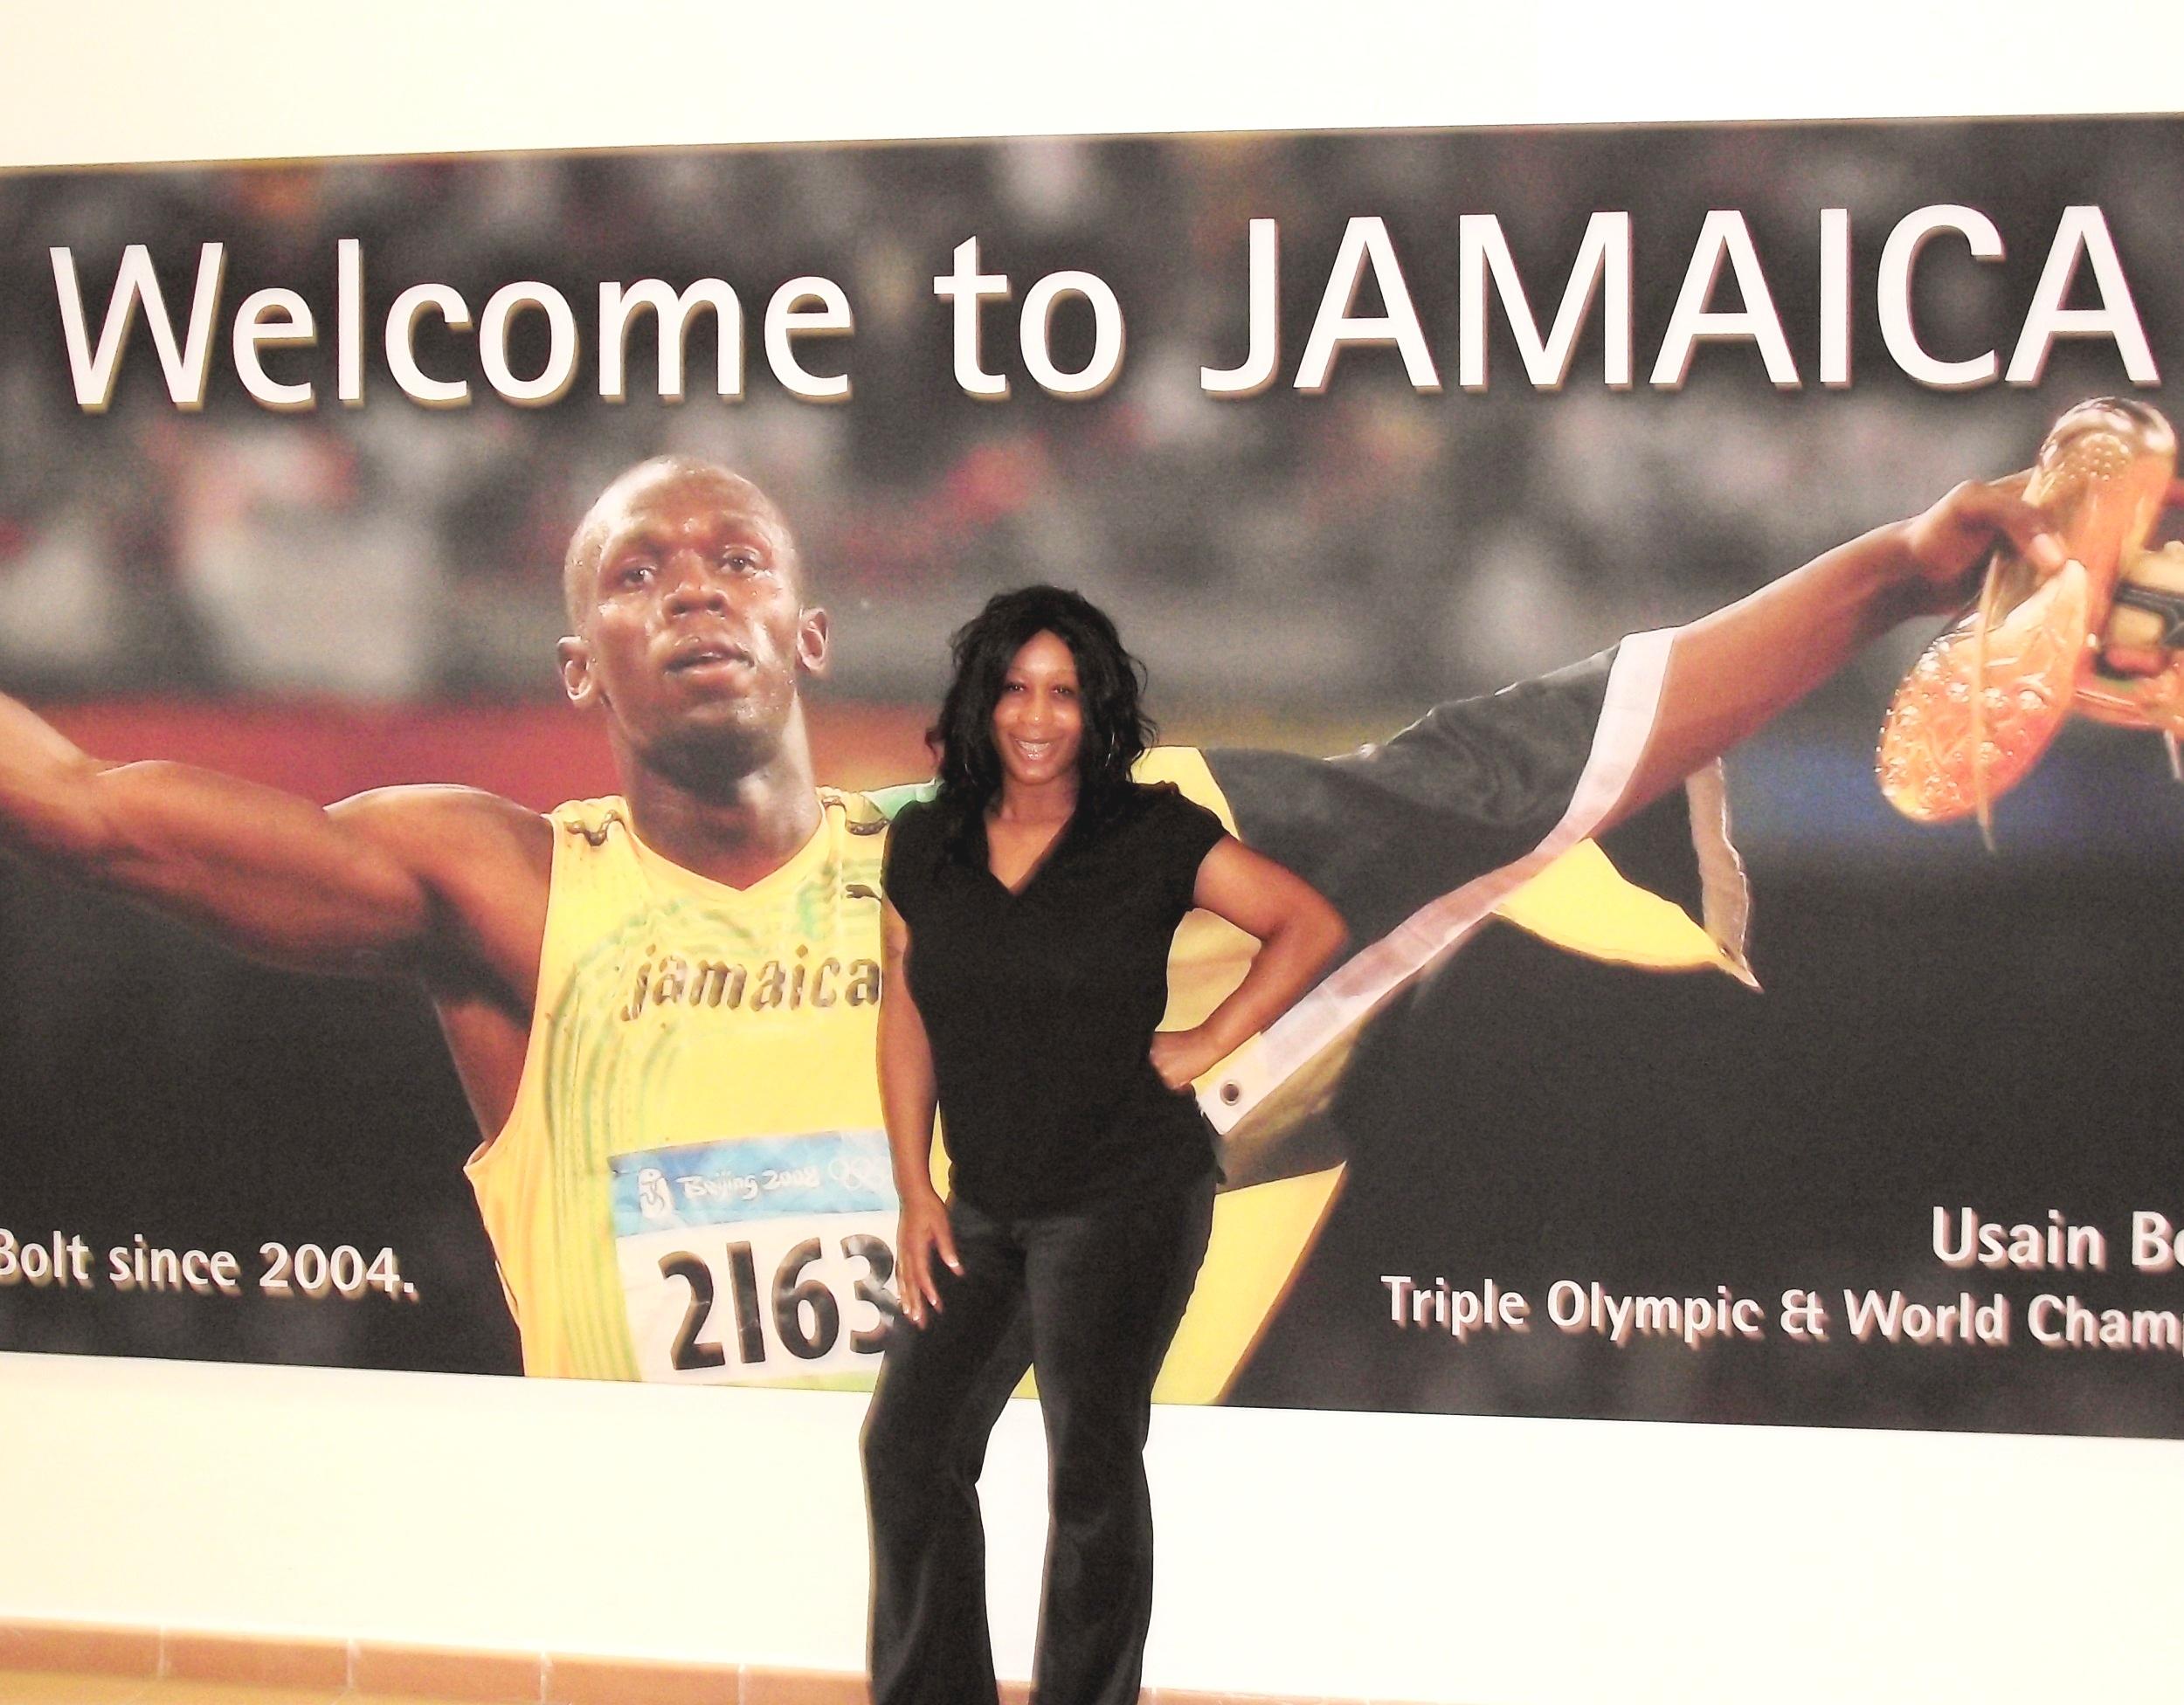 Kimberly C. Lyons_KCL-IDESIGN, LLC_Jamaica 2010 (352).JPG